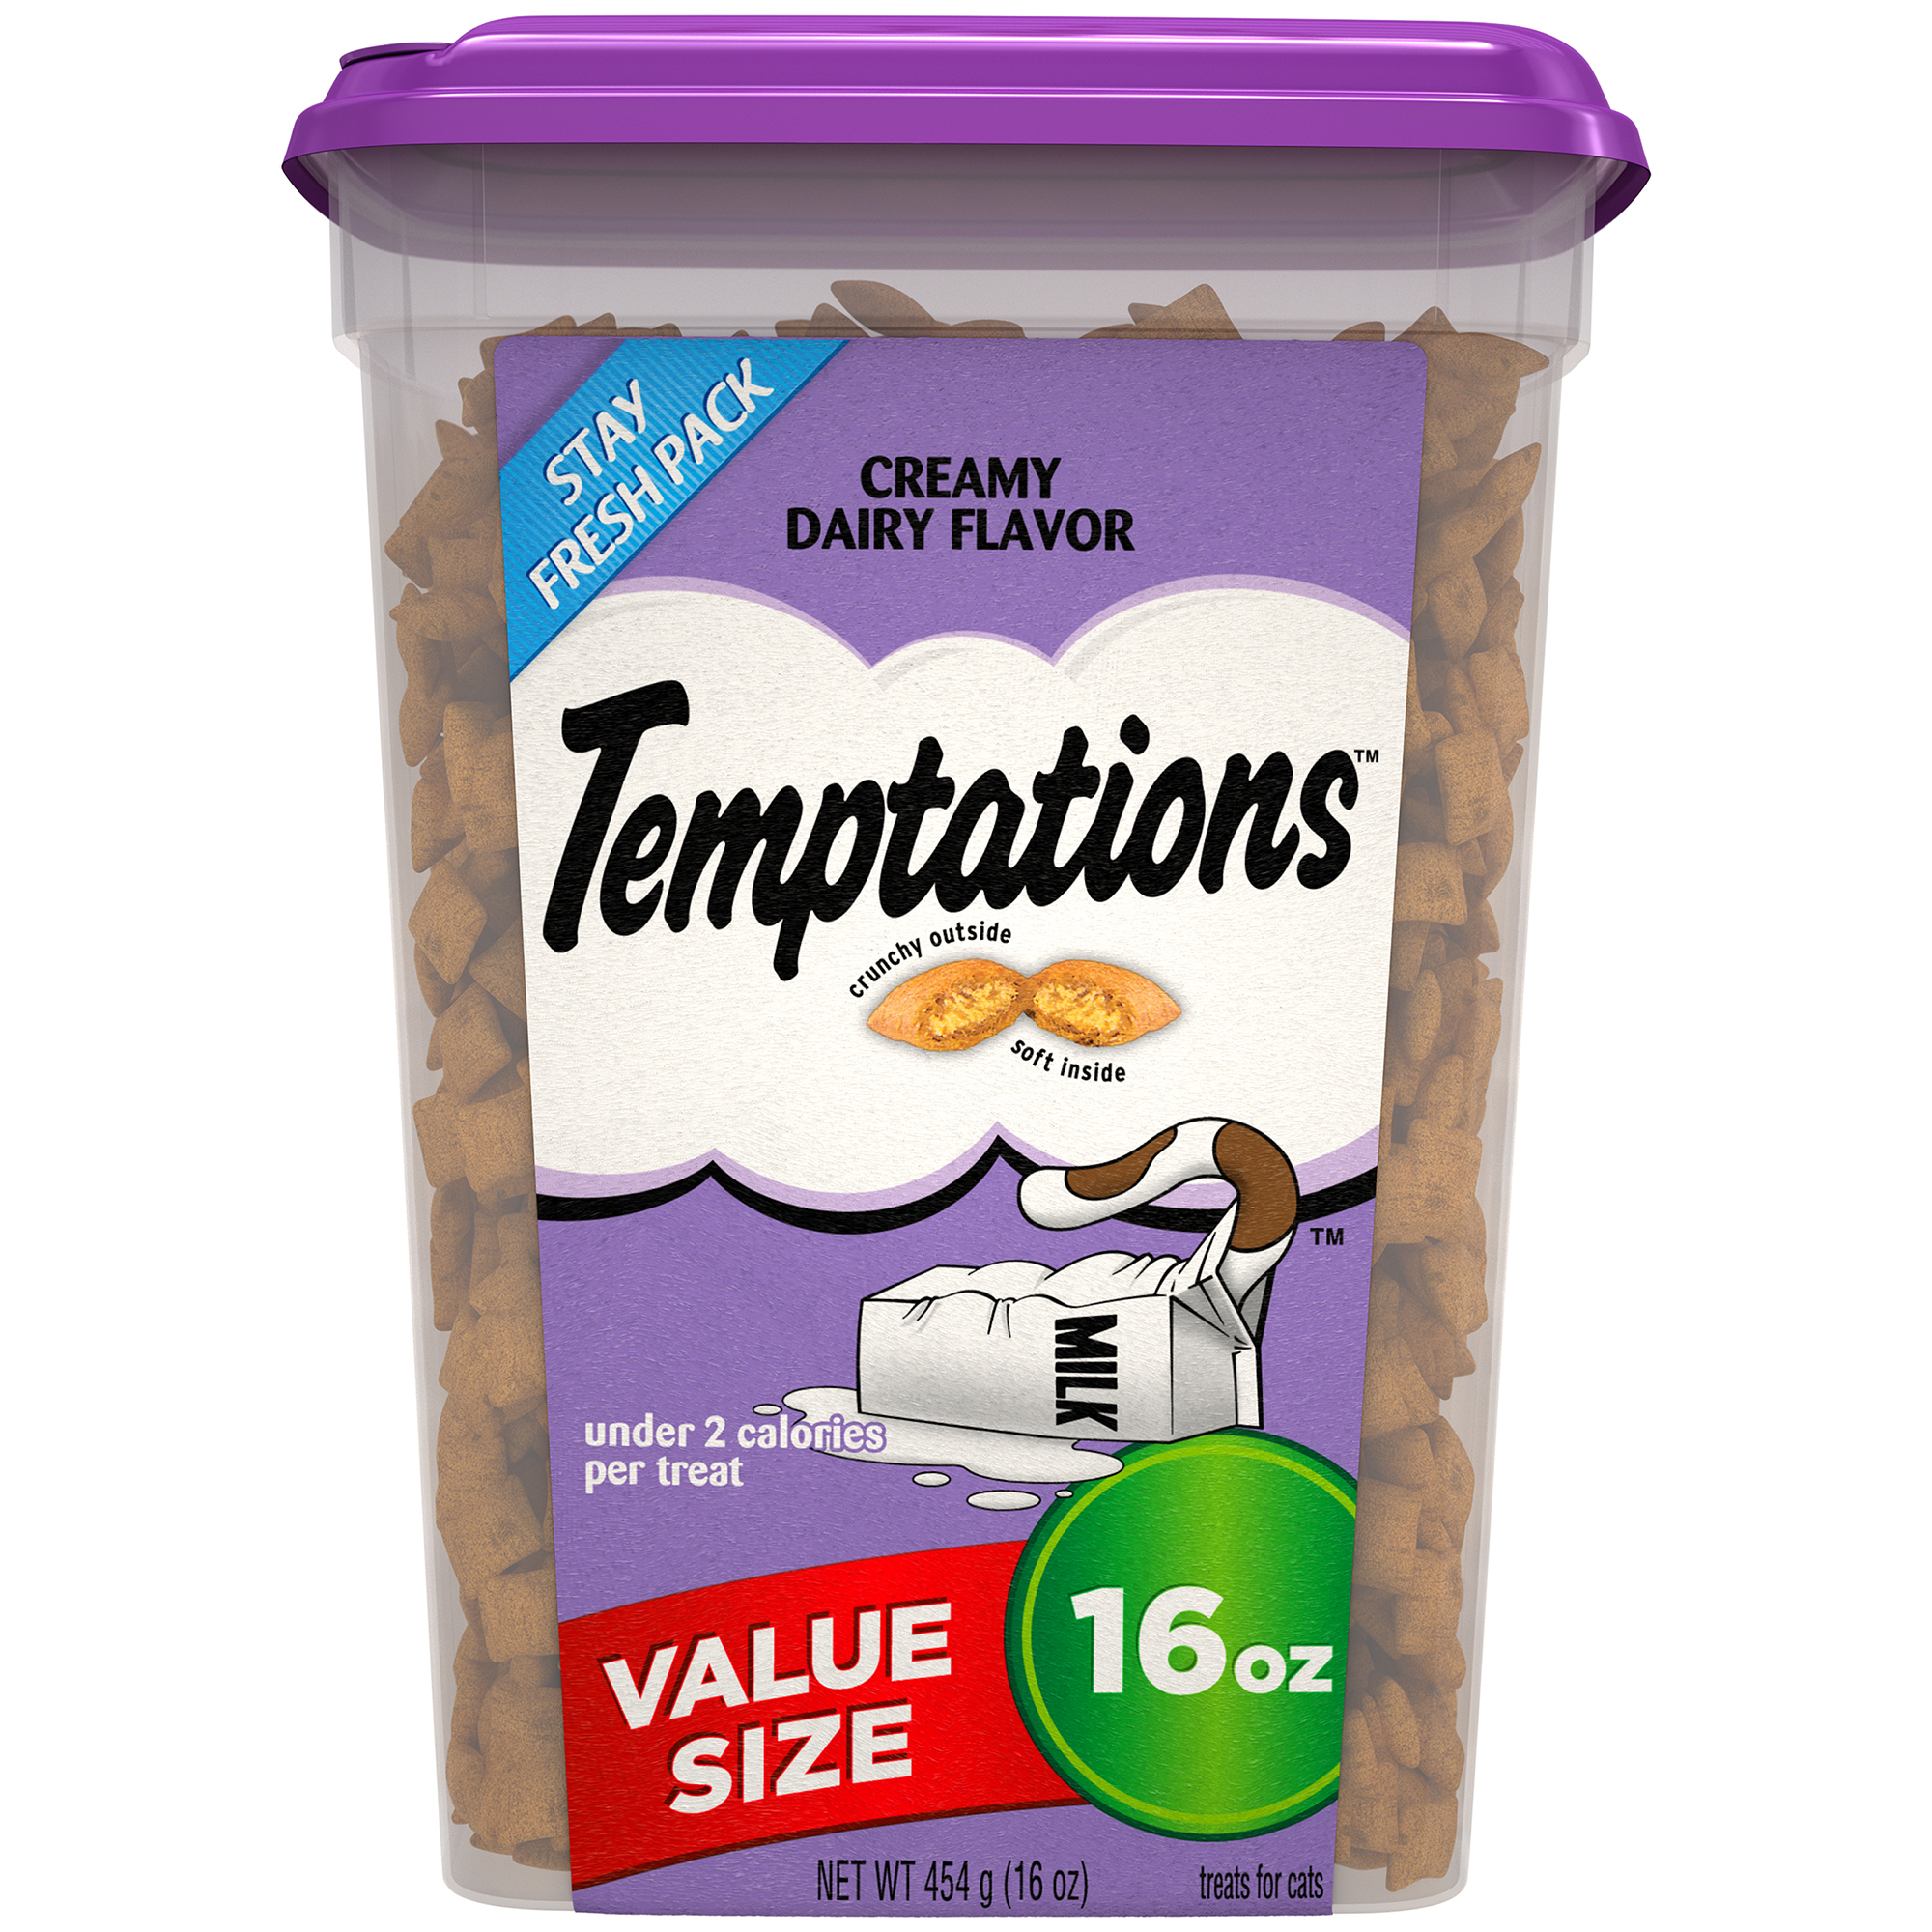 TEMPTATIONS Classic Treats for Cats Creamy Dairy Flavor, 16 oz. Tub